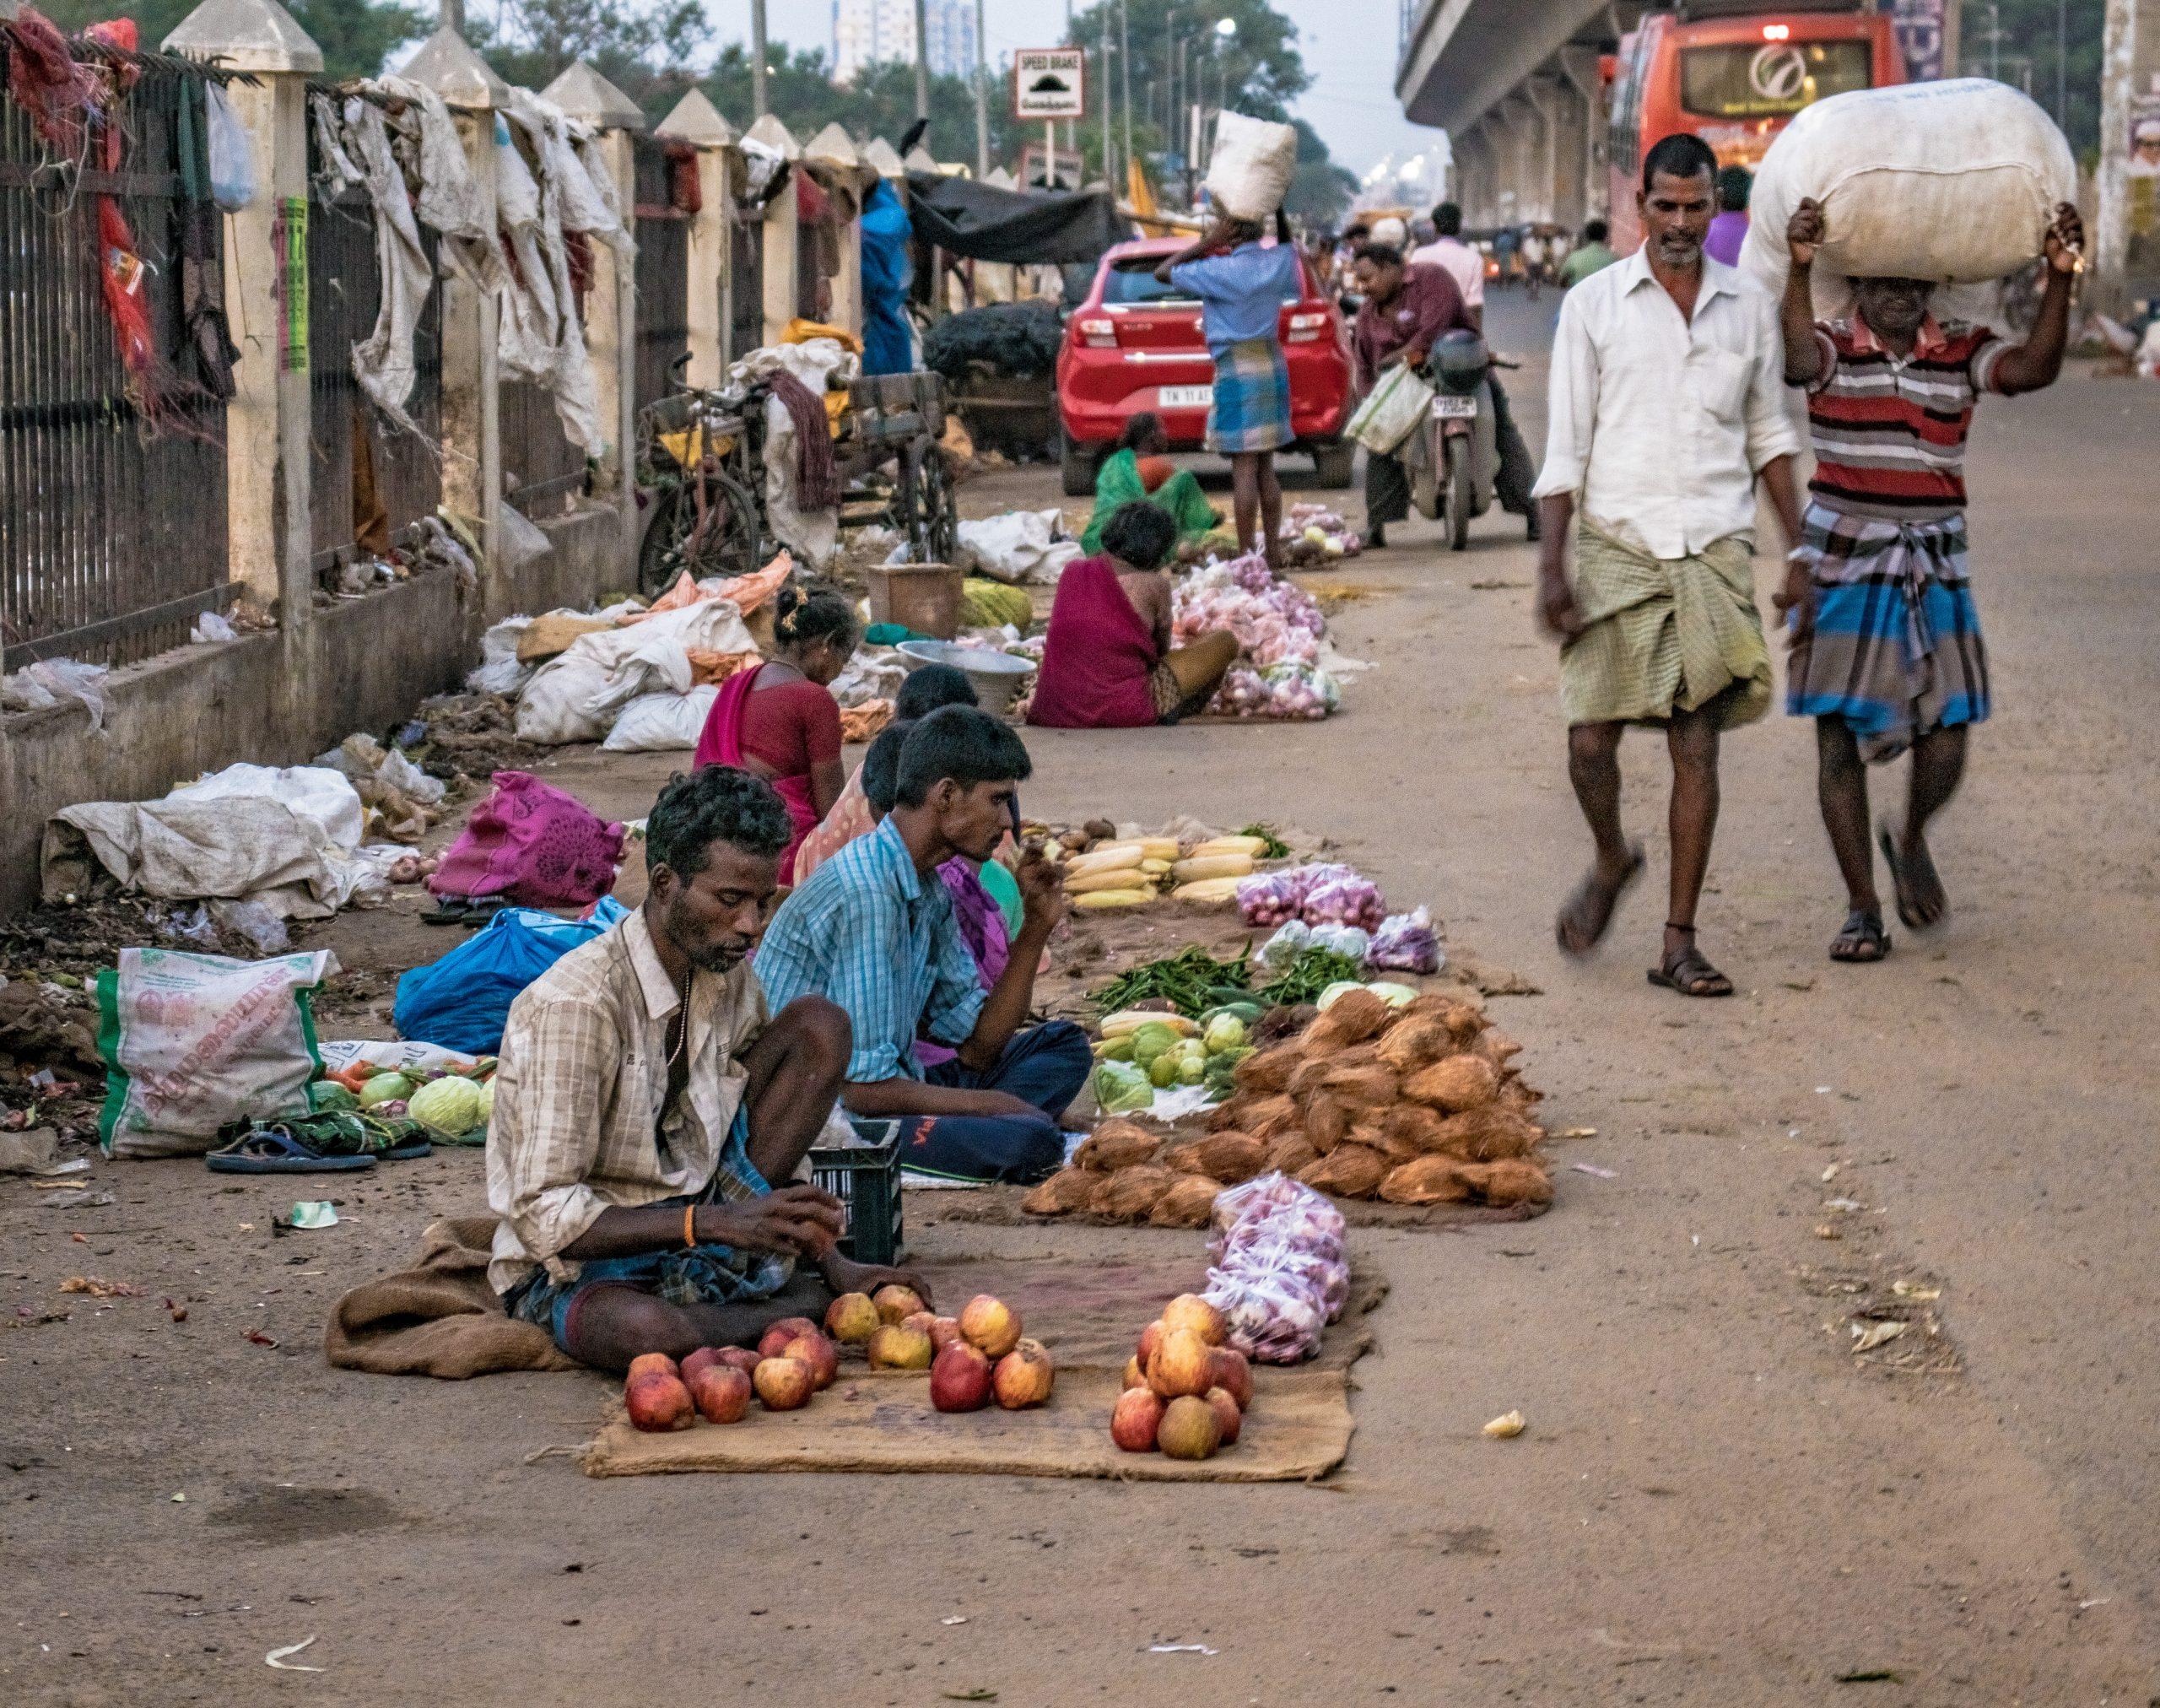 vendors on a street